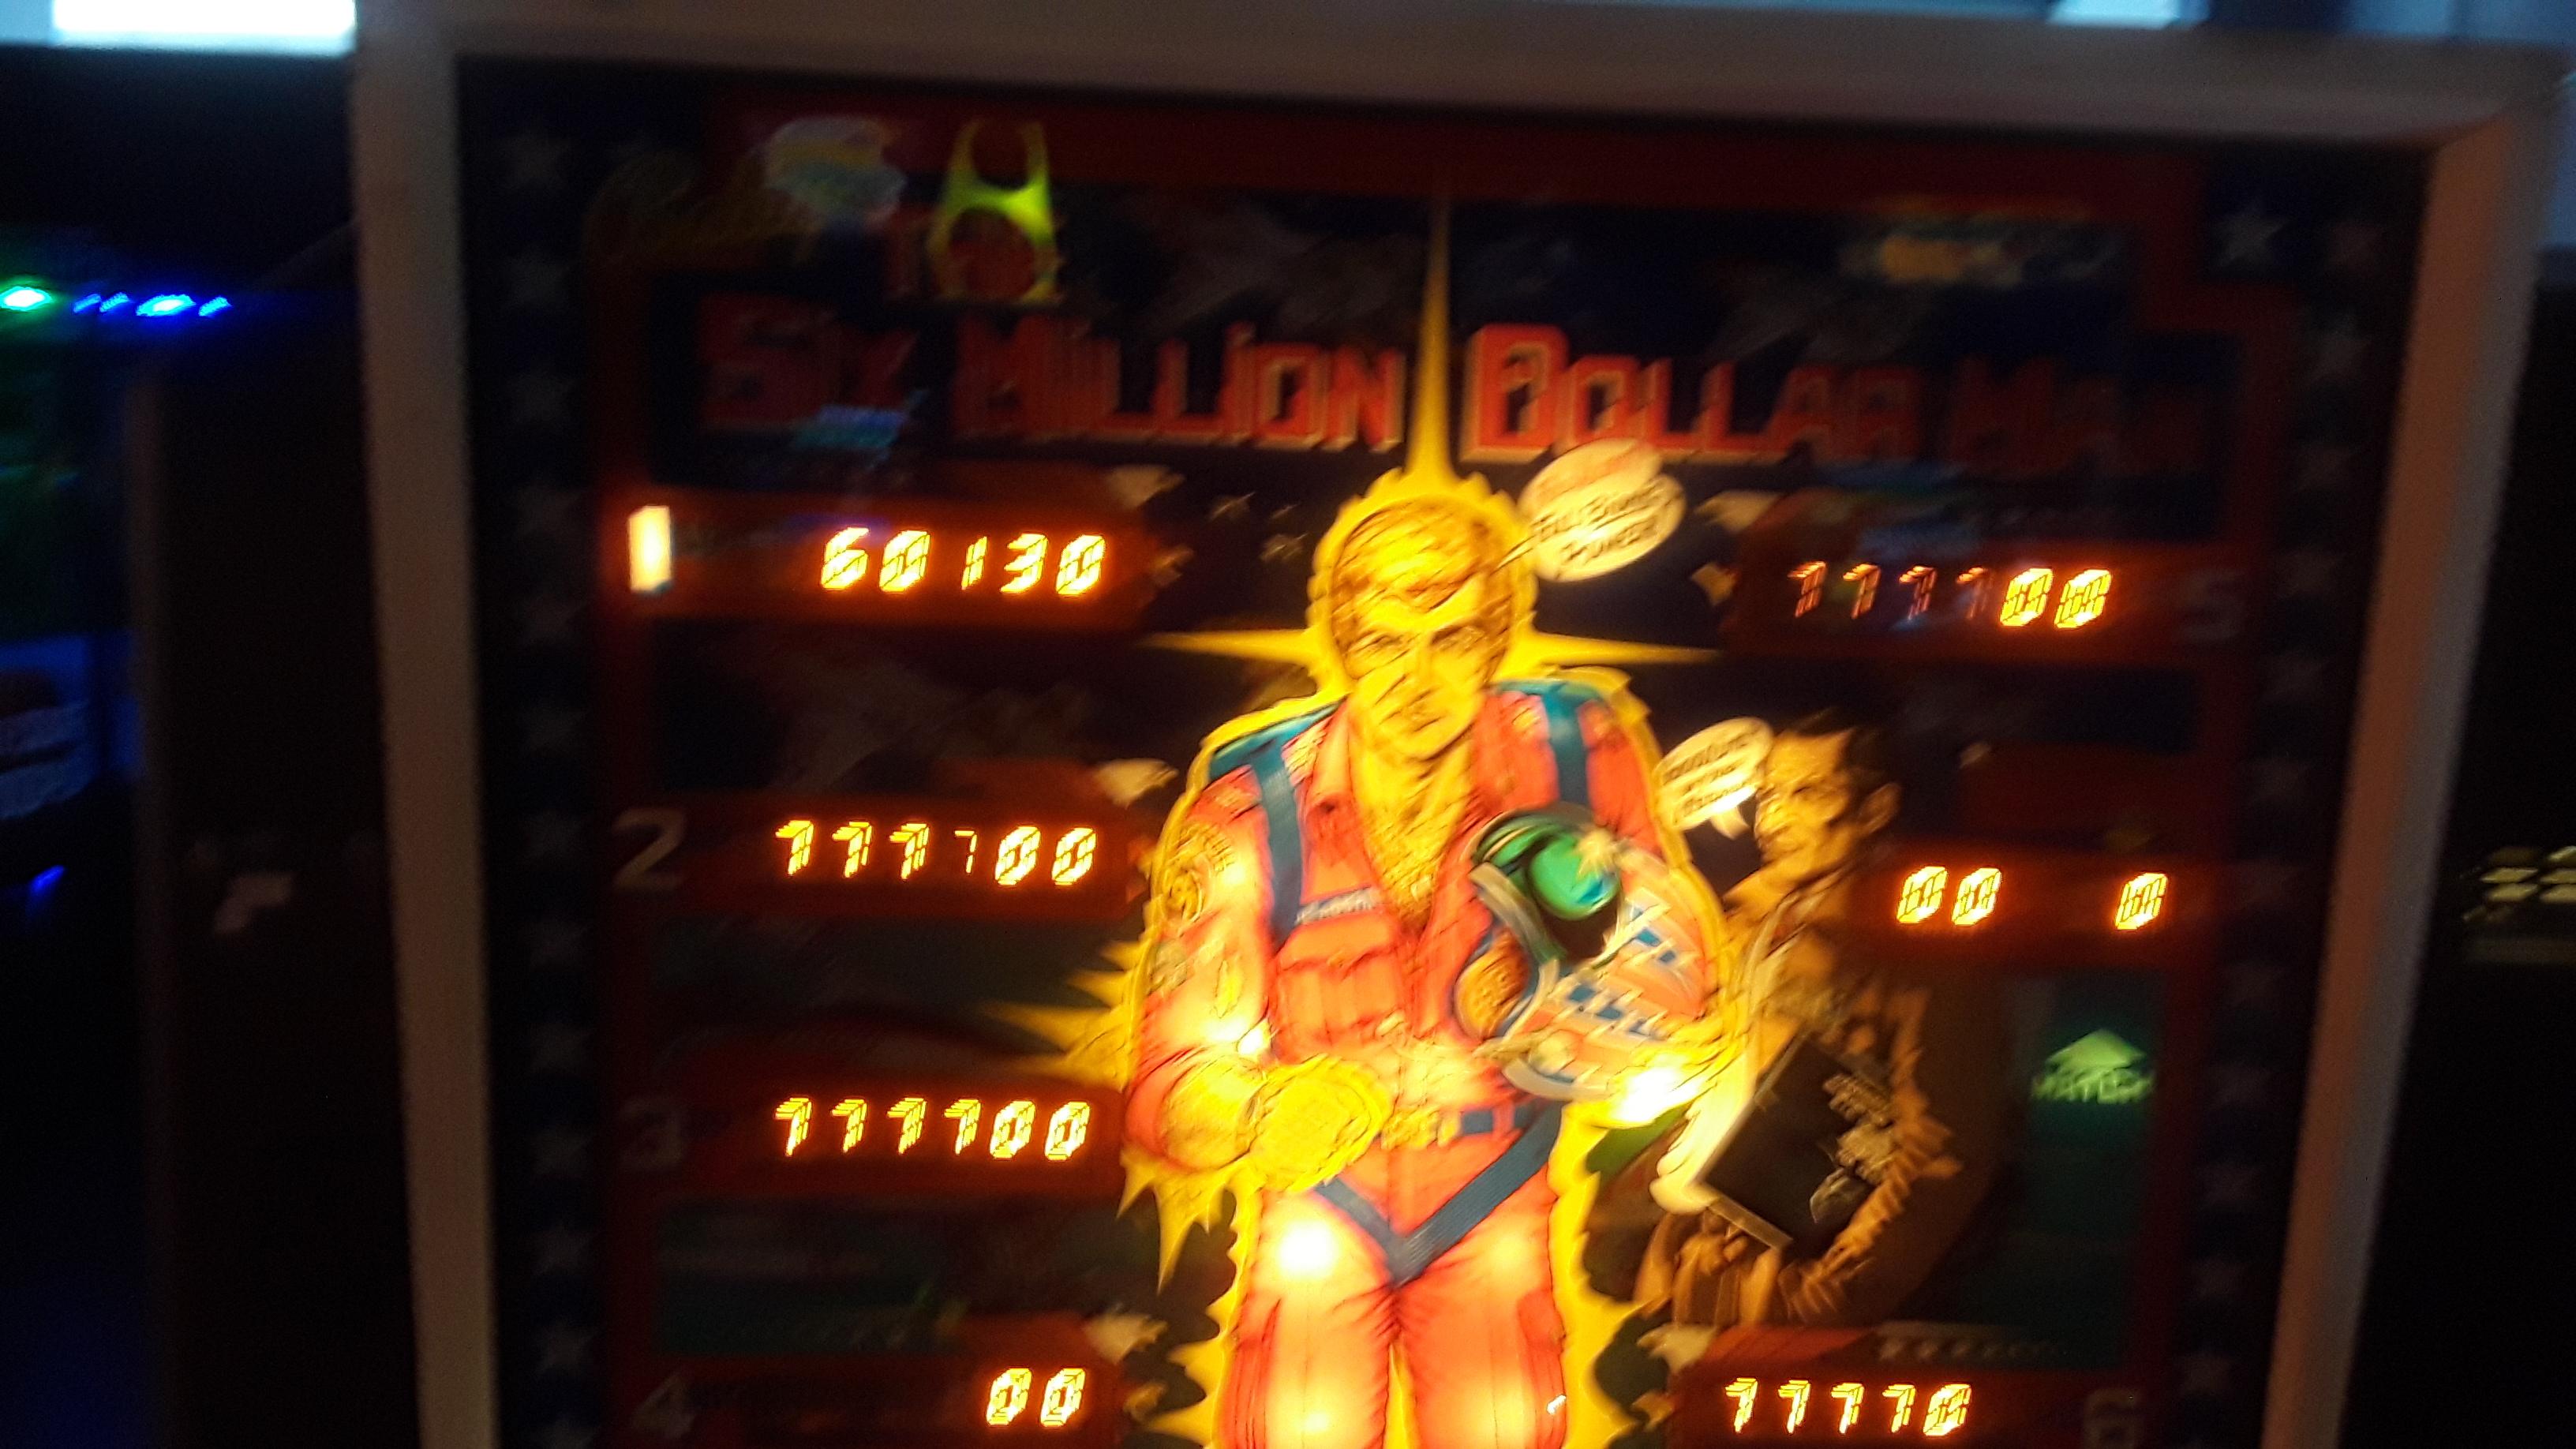 JML101582: Six Million Dollar Man (Pinball: 3 Balls) 60,130 points on 2020-02-21 15:29:02